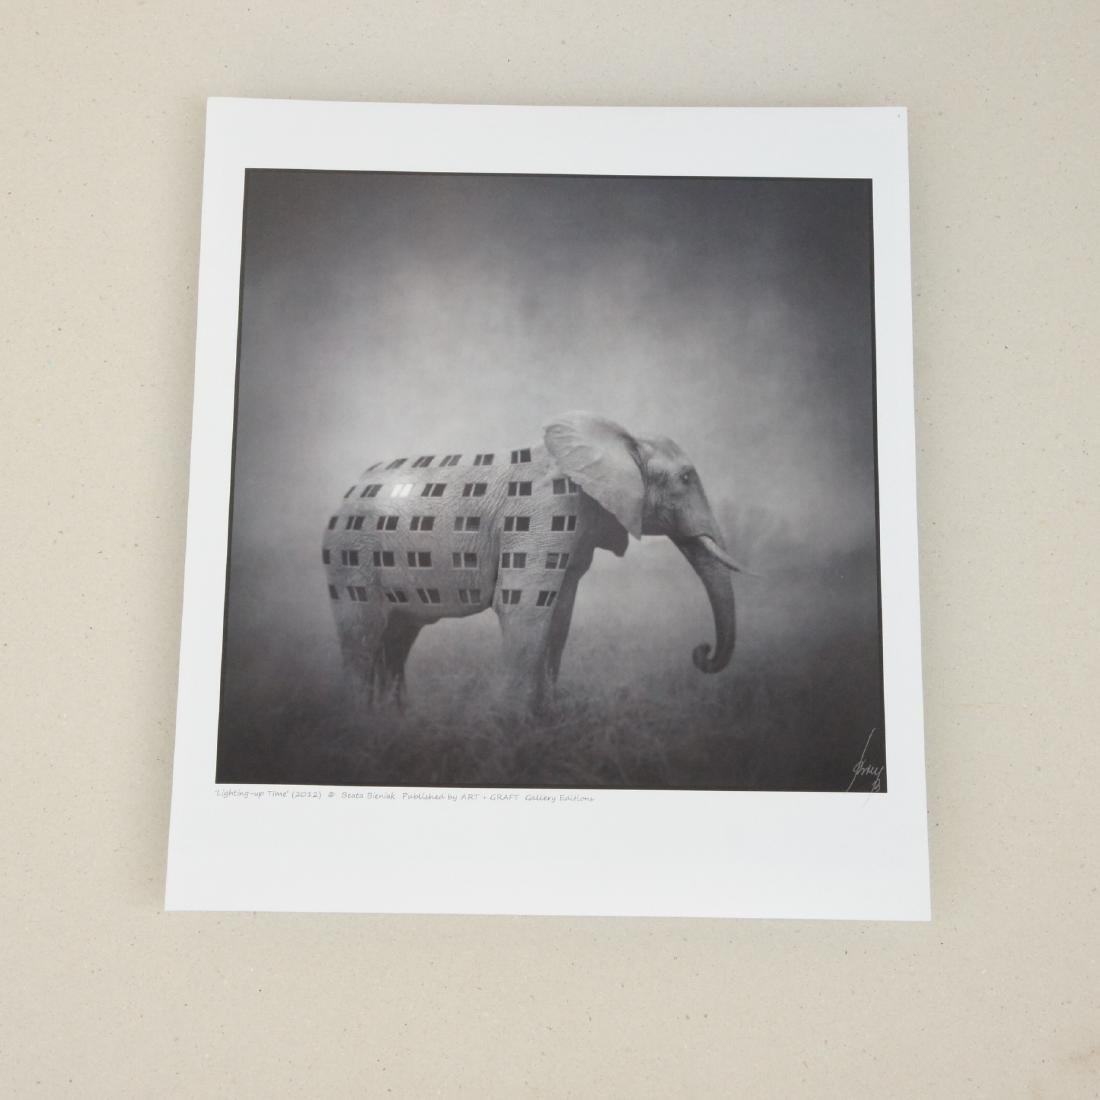 Beata Bieniak - Print - Lighting-up time - 2